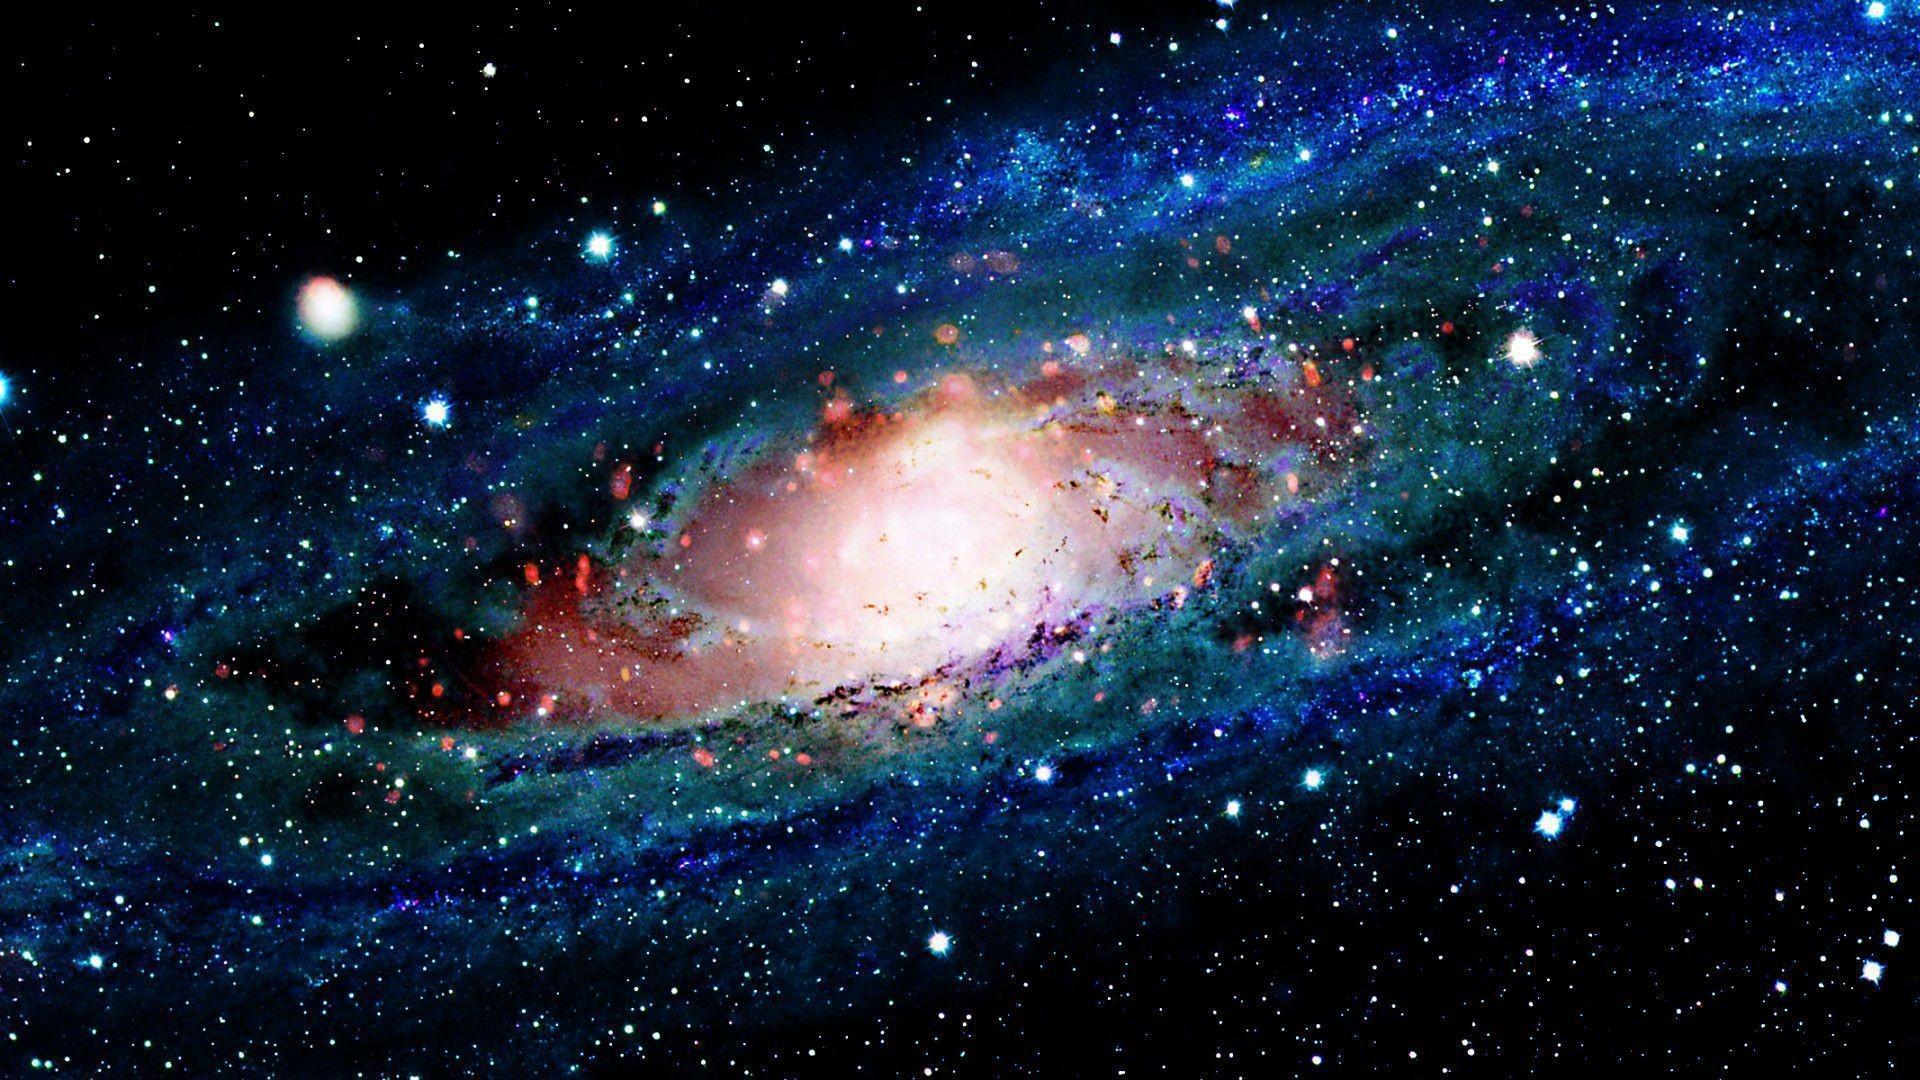 Galaxy Desktop Backgrounds 83 Pictures